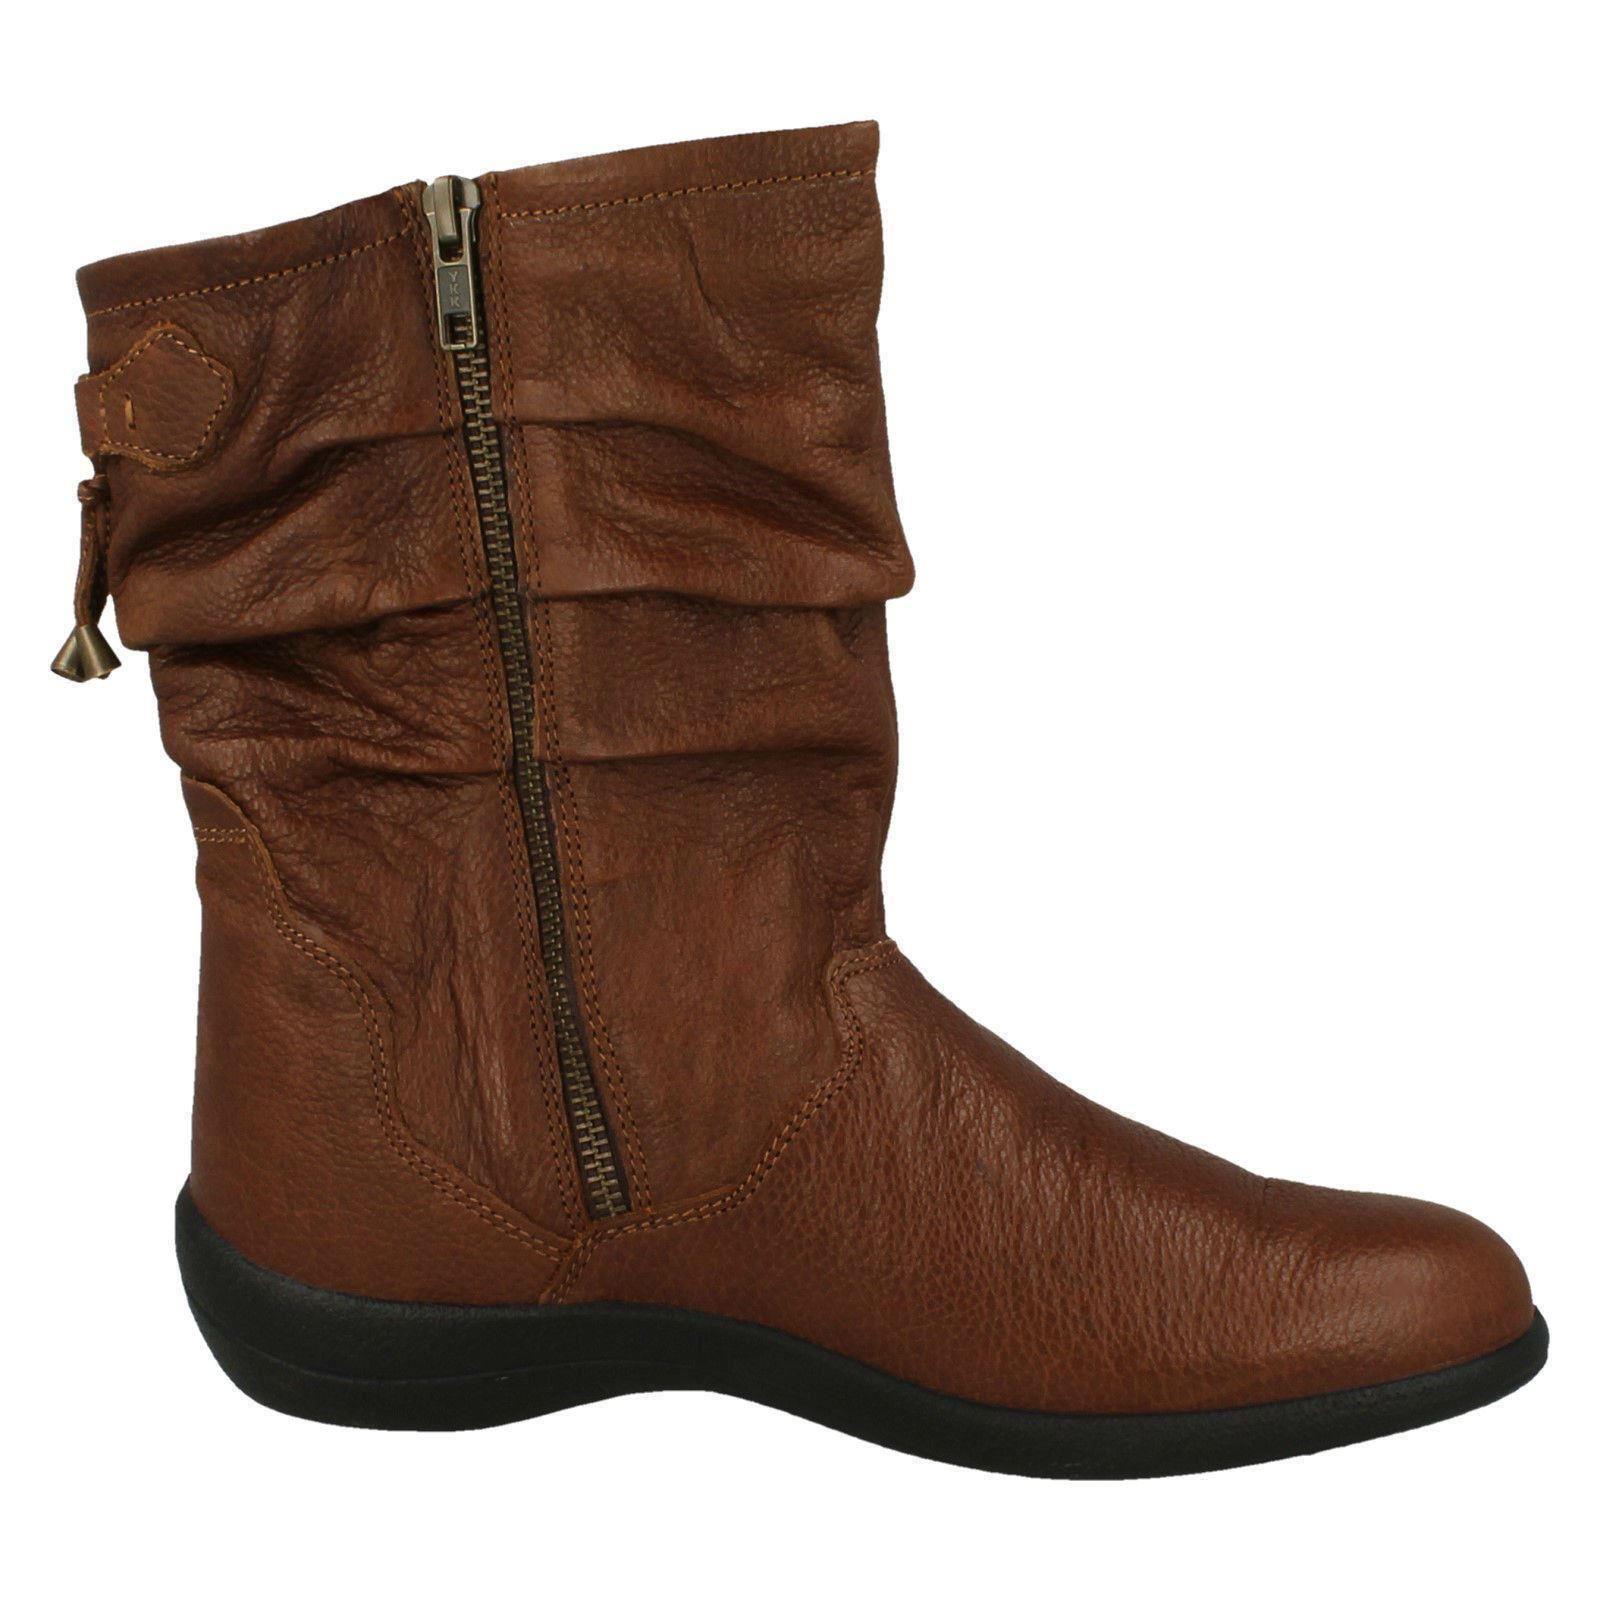 Bottes femme pied large